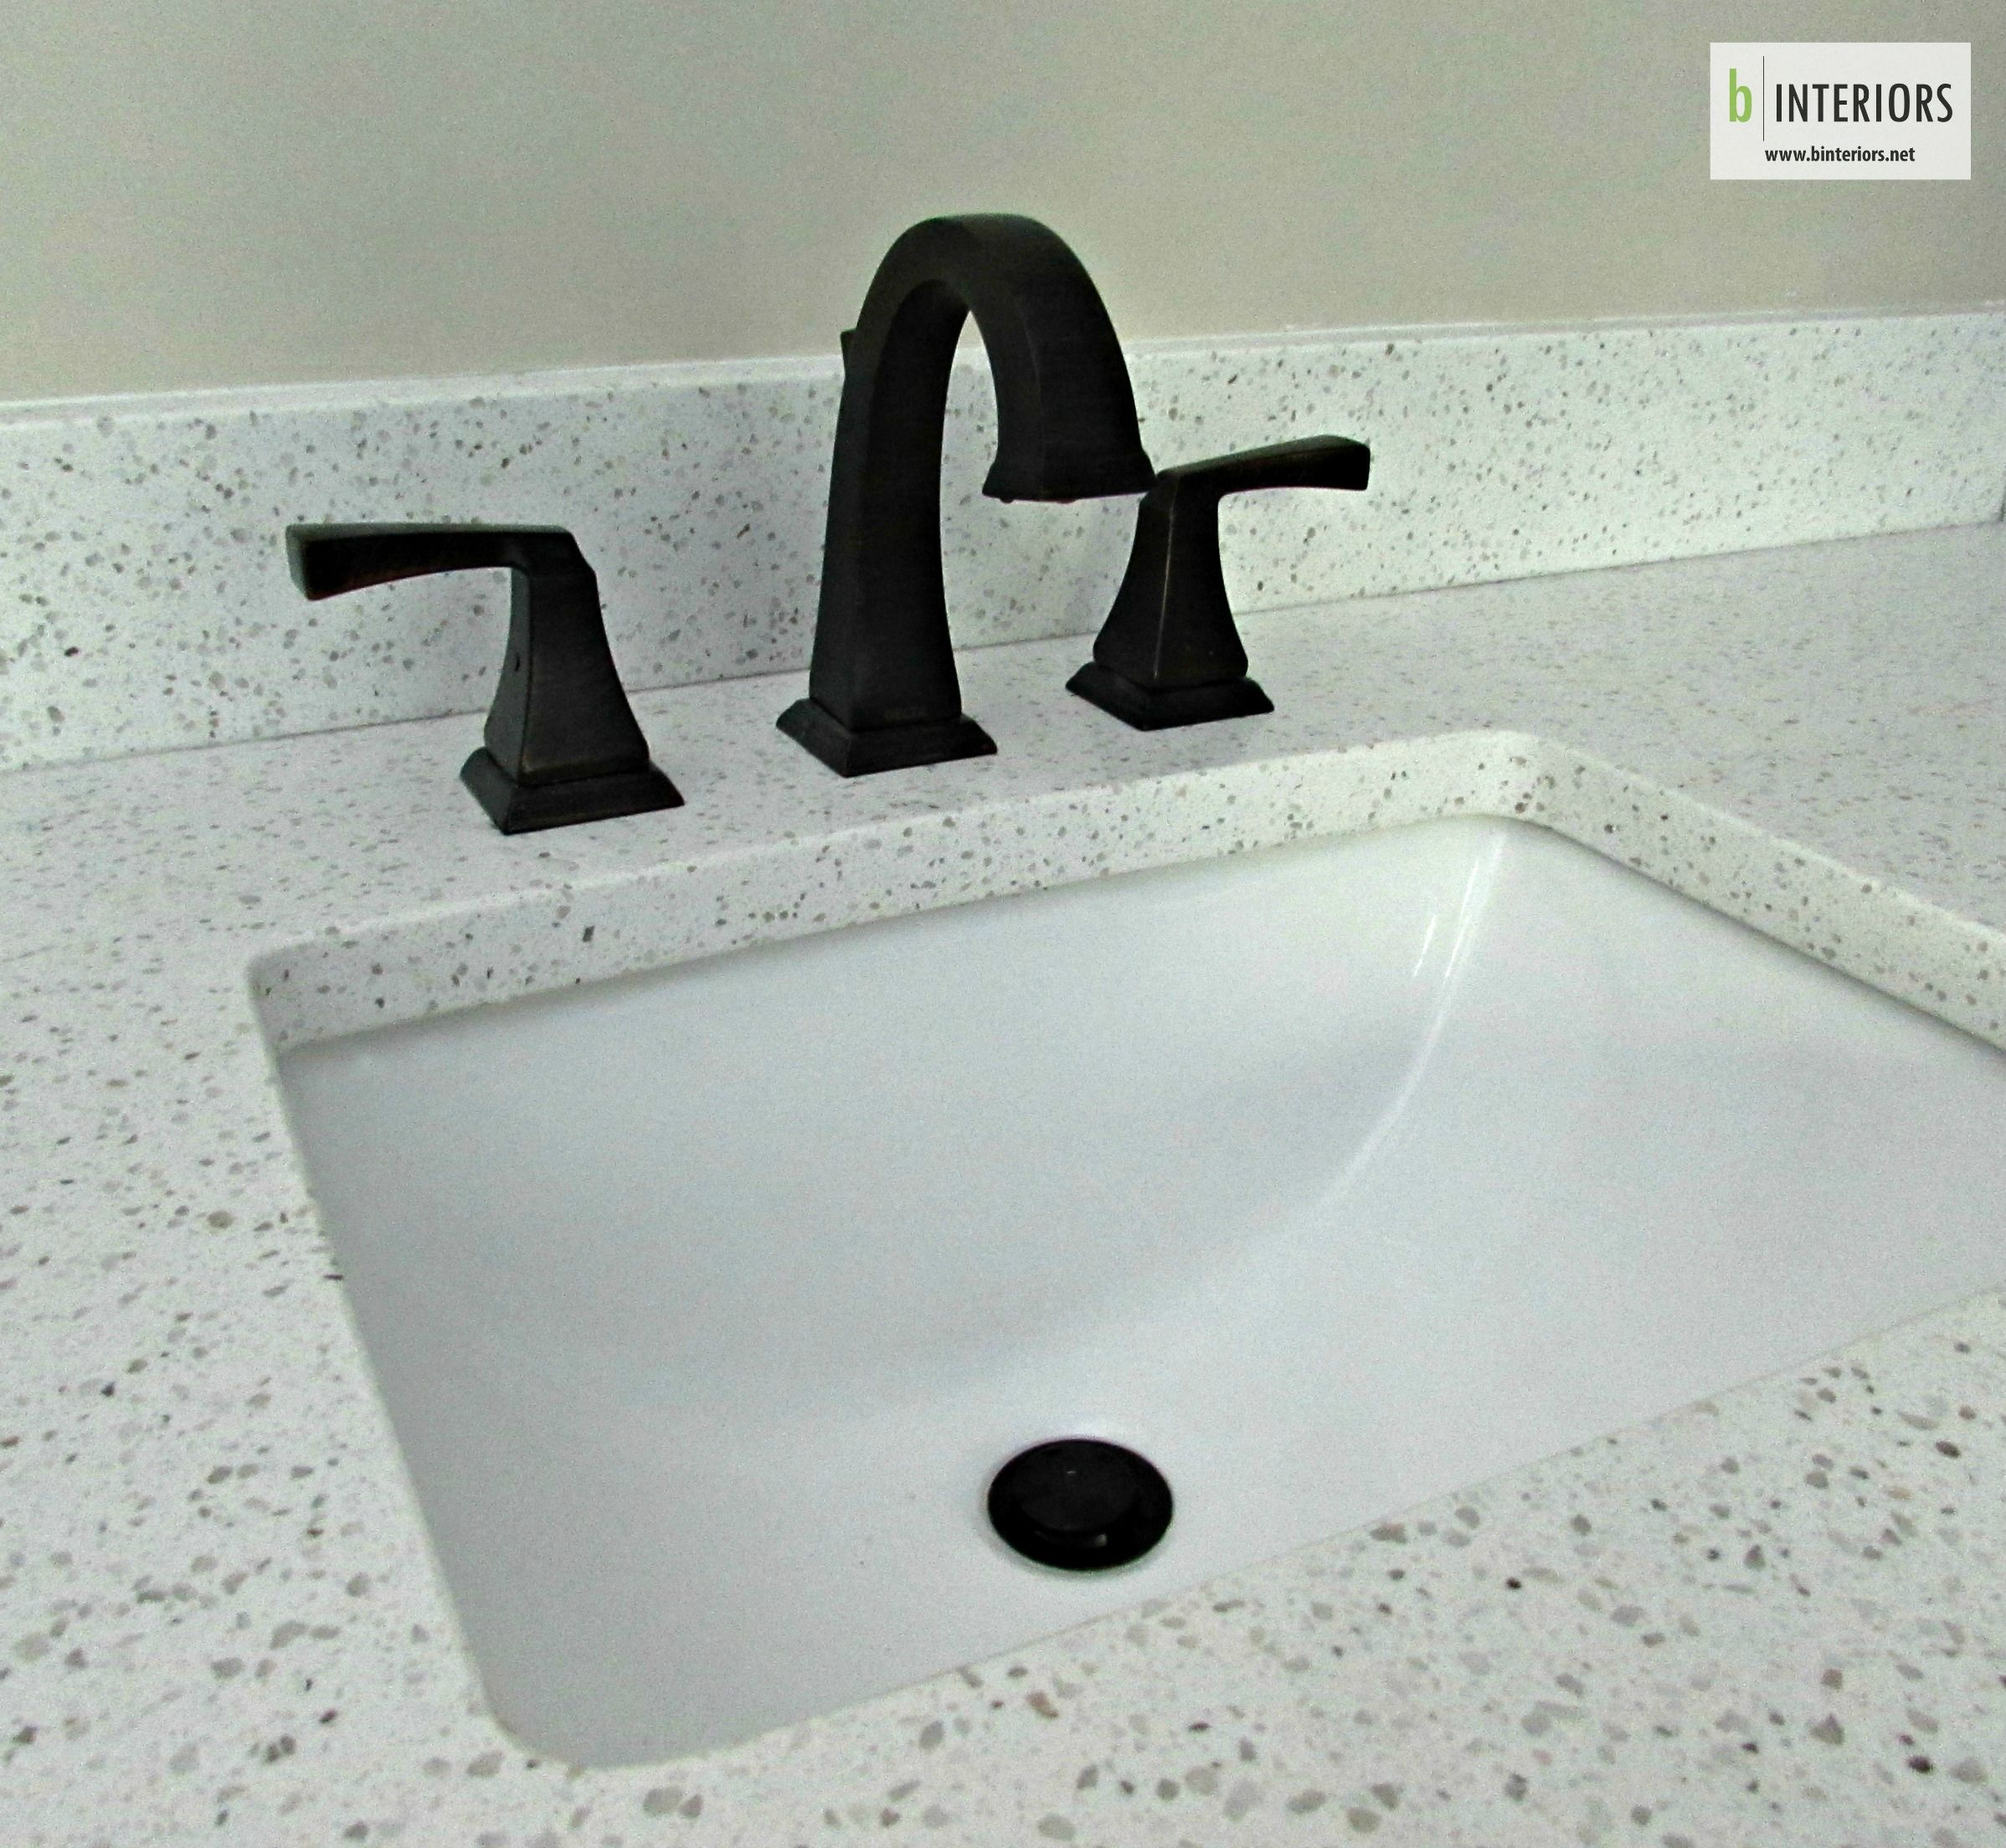 Bath remodel by b interiors alpharetta ga delta dryden